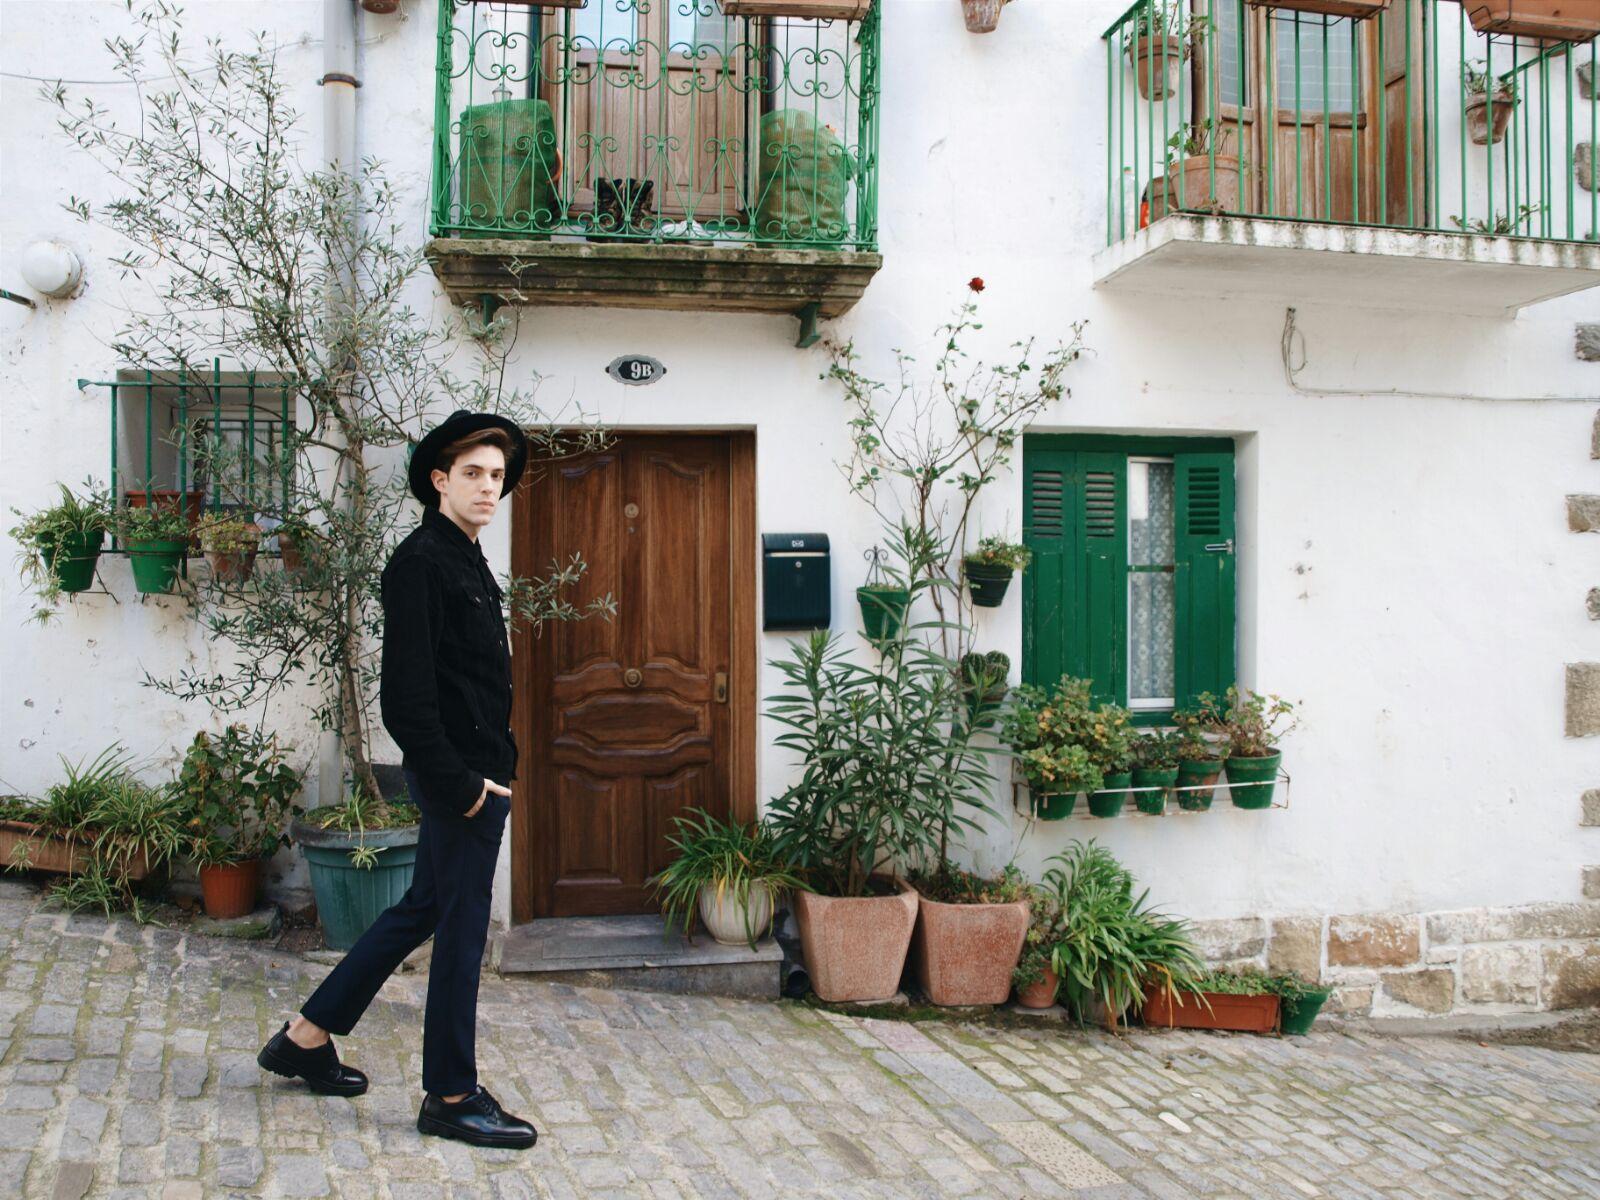 Coastalandco-blog-hendaye-fuenterrabia-navy-black-man-post-zara-komono-jacket-pants